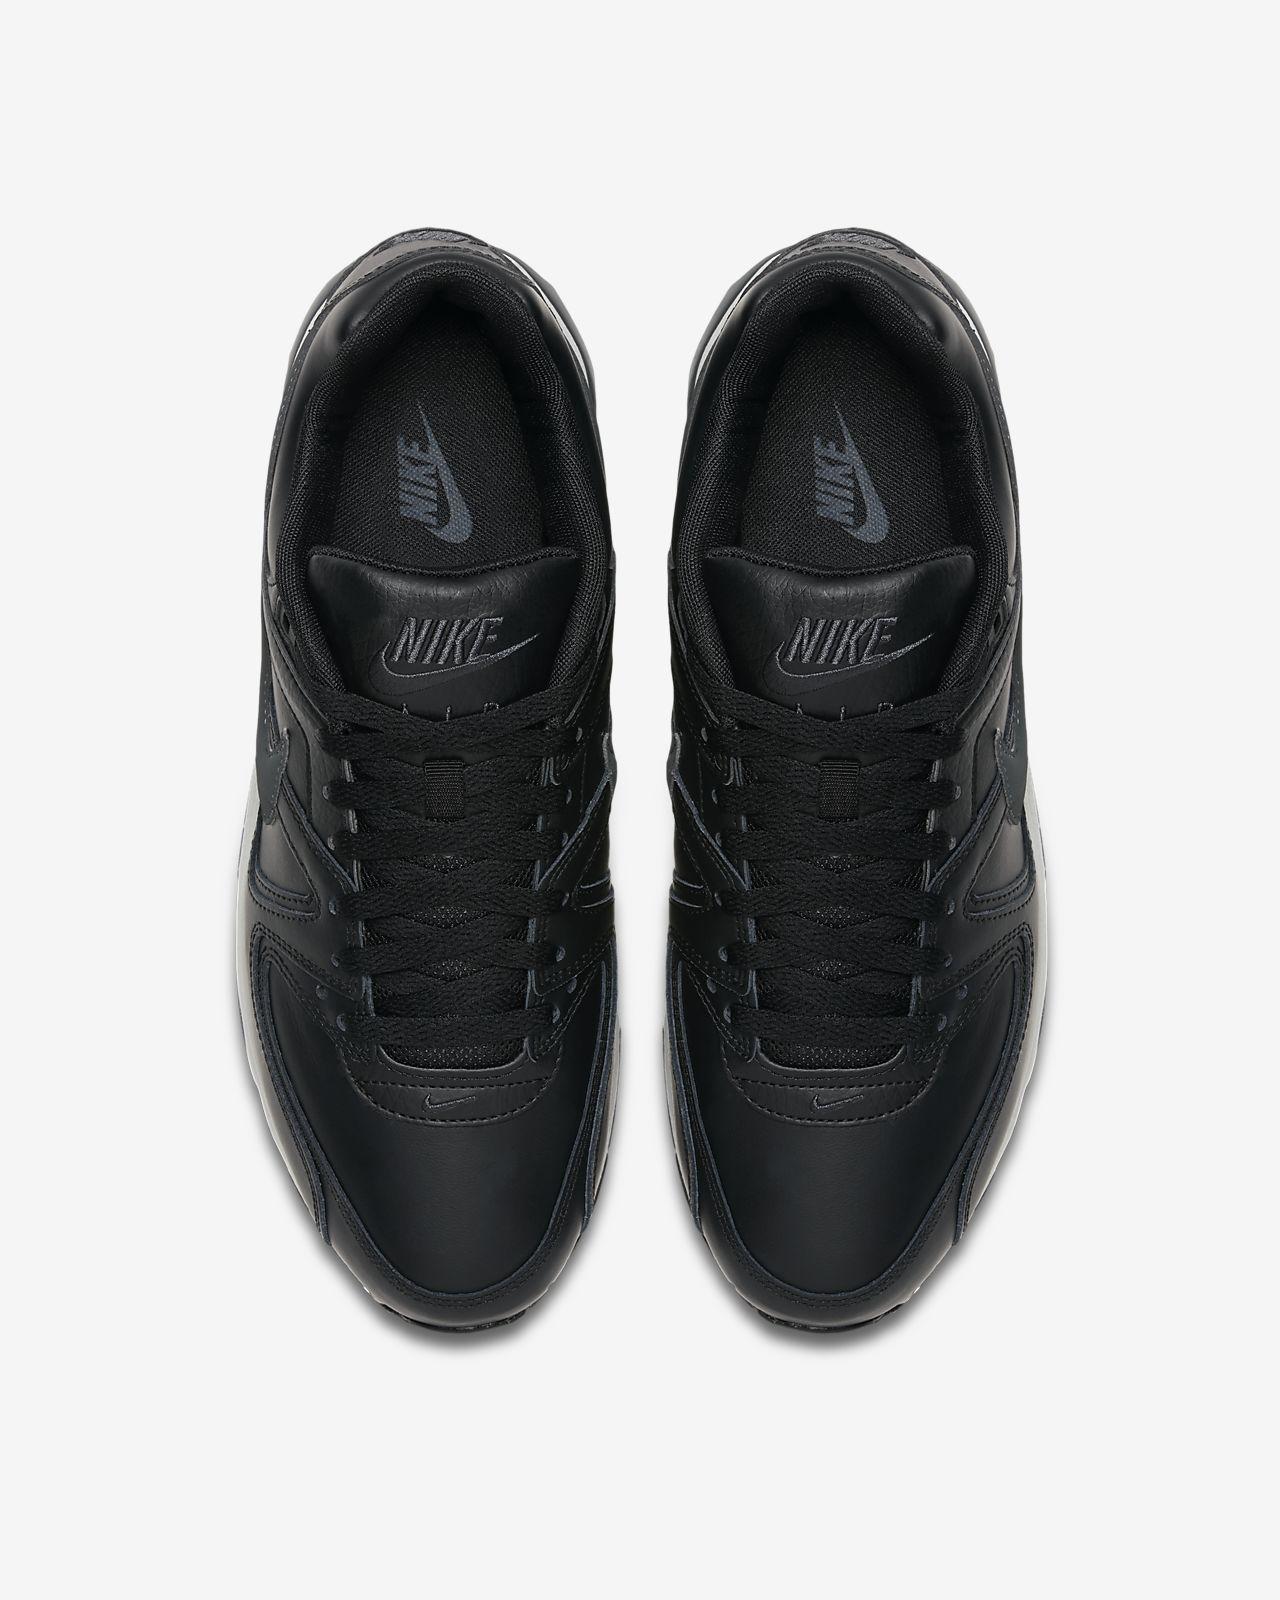 Buty męskie Nike Air Max Command